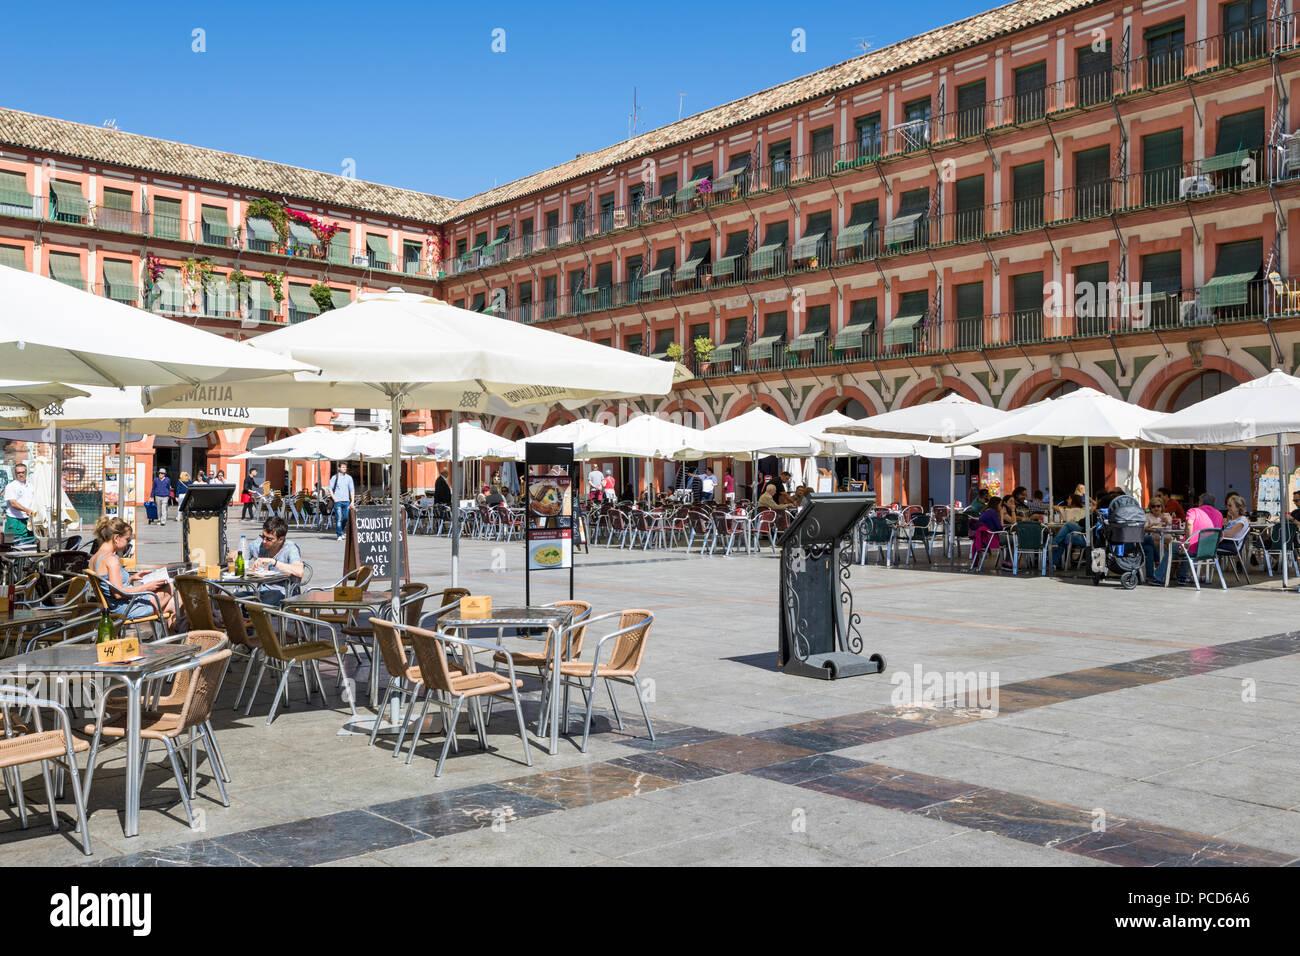 Cafés und Restaurants in der Plaza de la Corredera, Cordoba, Andalusien, Spanien, Europa Stockbild